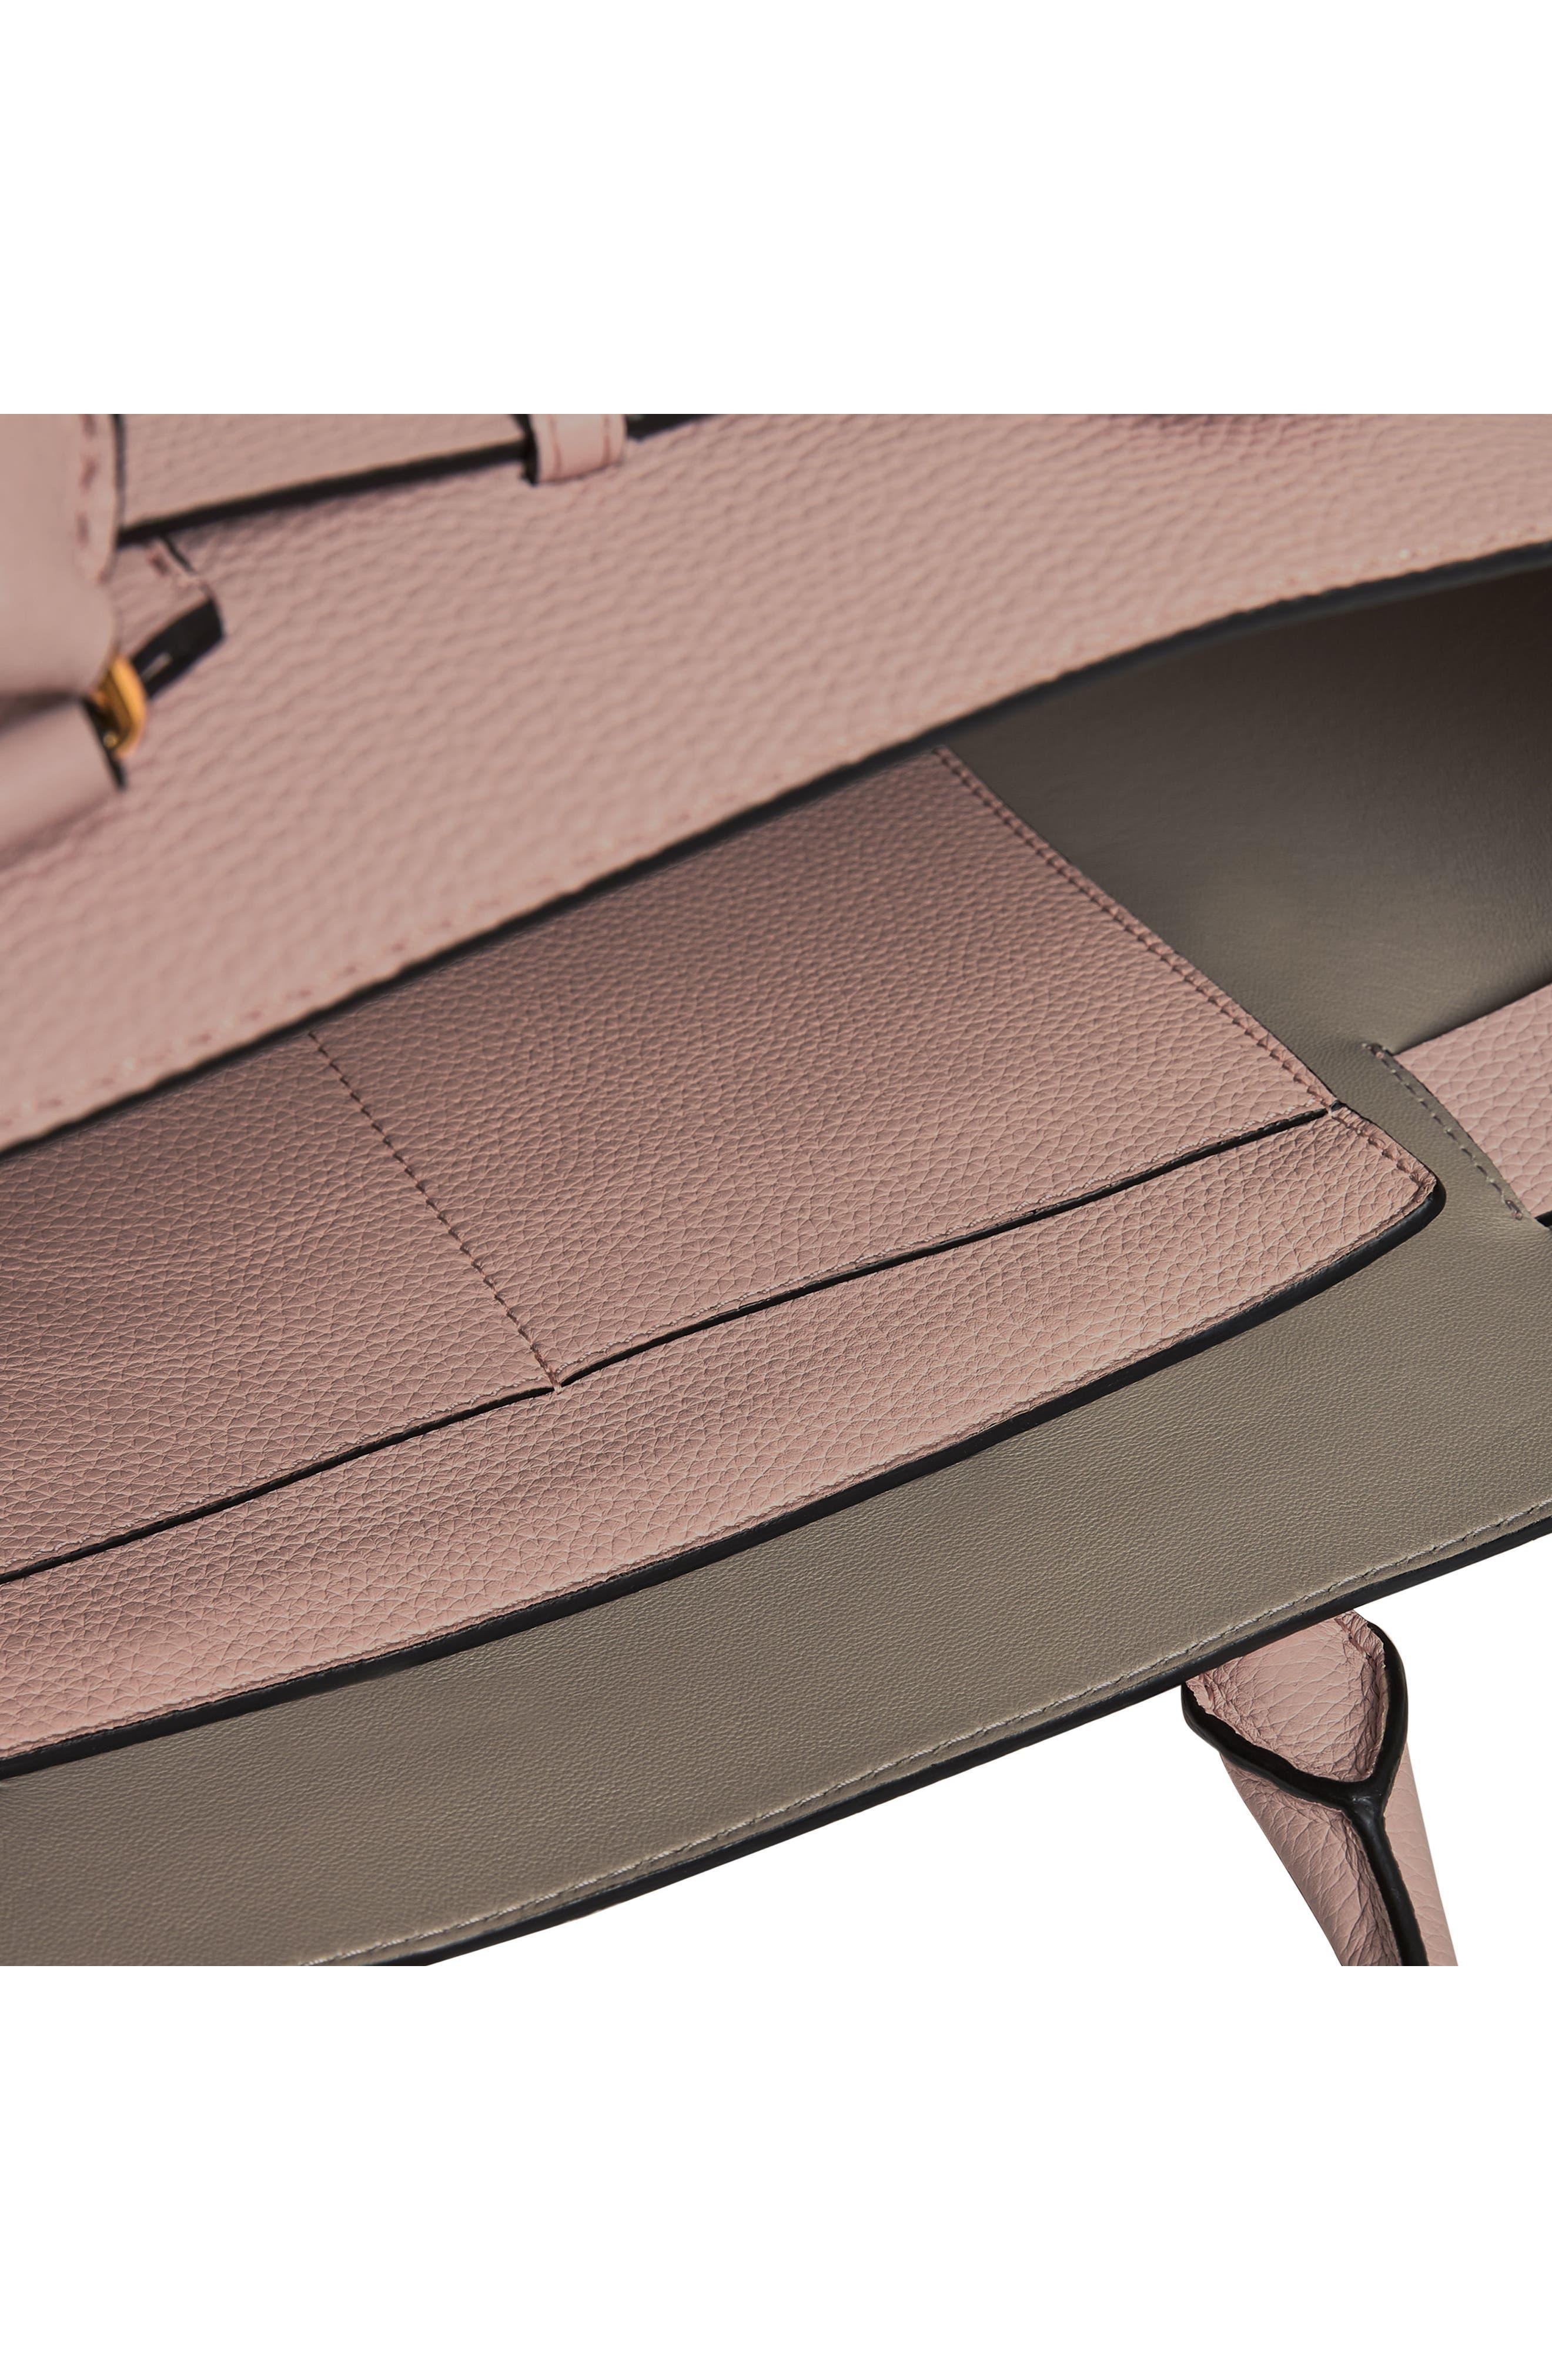 Medium Belt Bag Leather Tote,                             Alternate thumbnail 9, color,                             PALE ASH ROSE